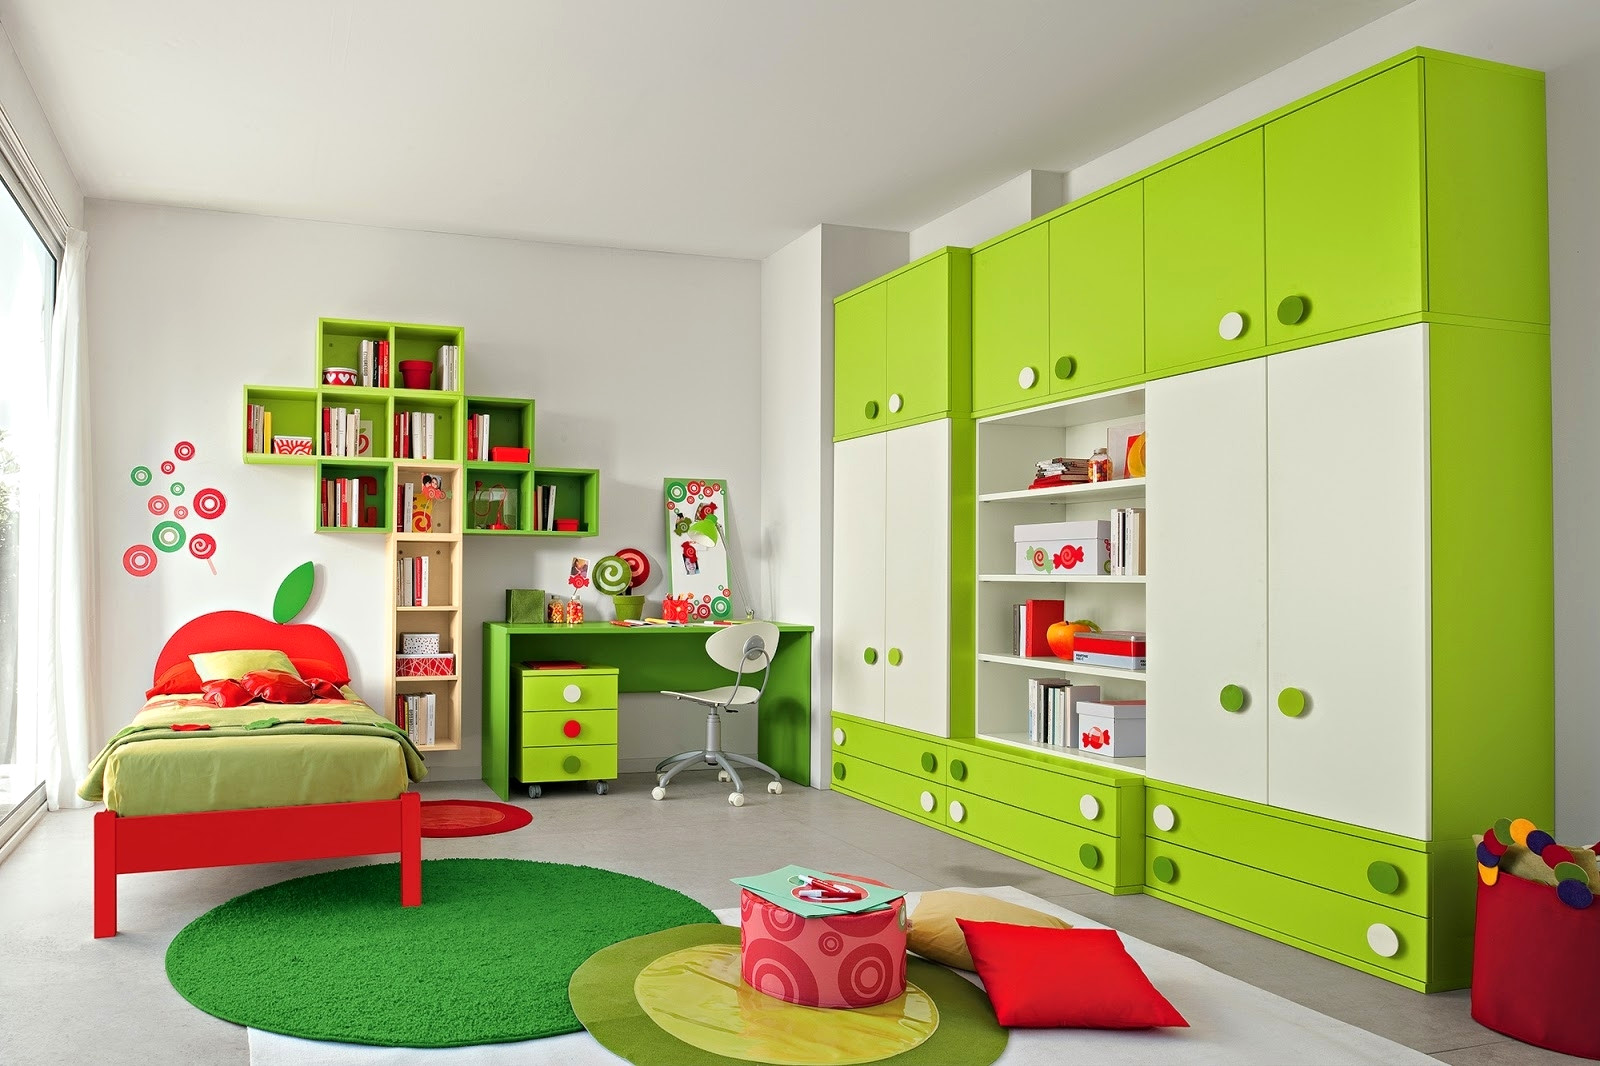 صور غرف نوم اطفال اولاد , صور غرف نوم للاطفال